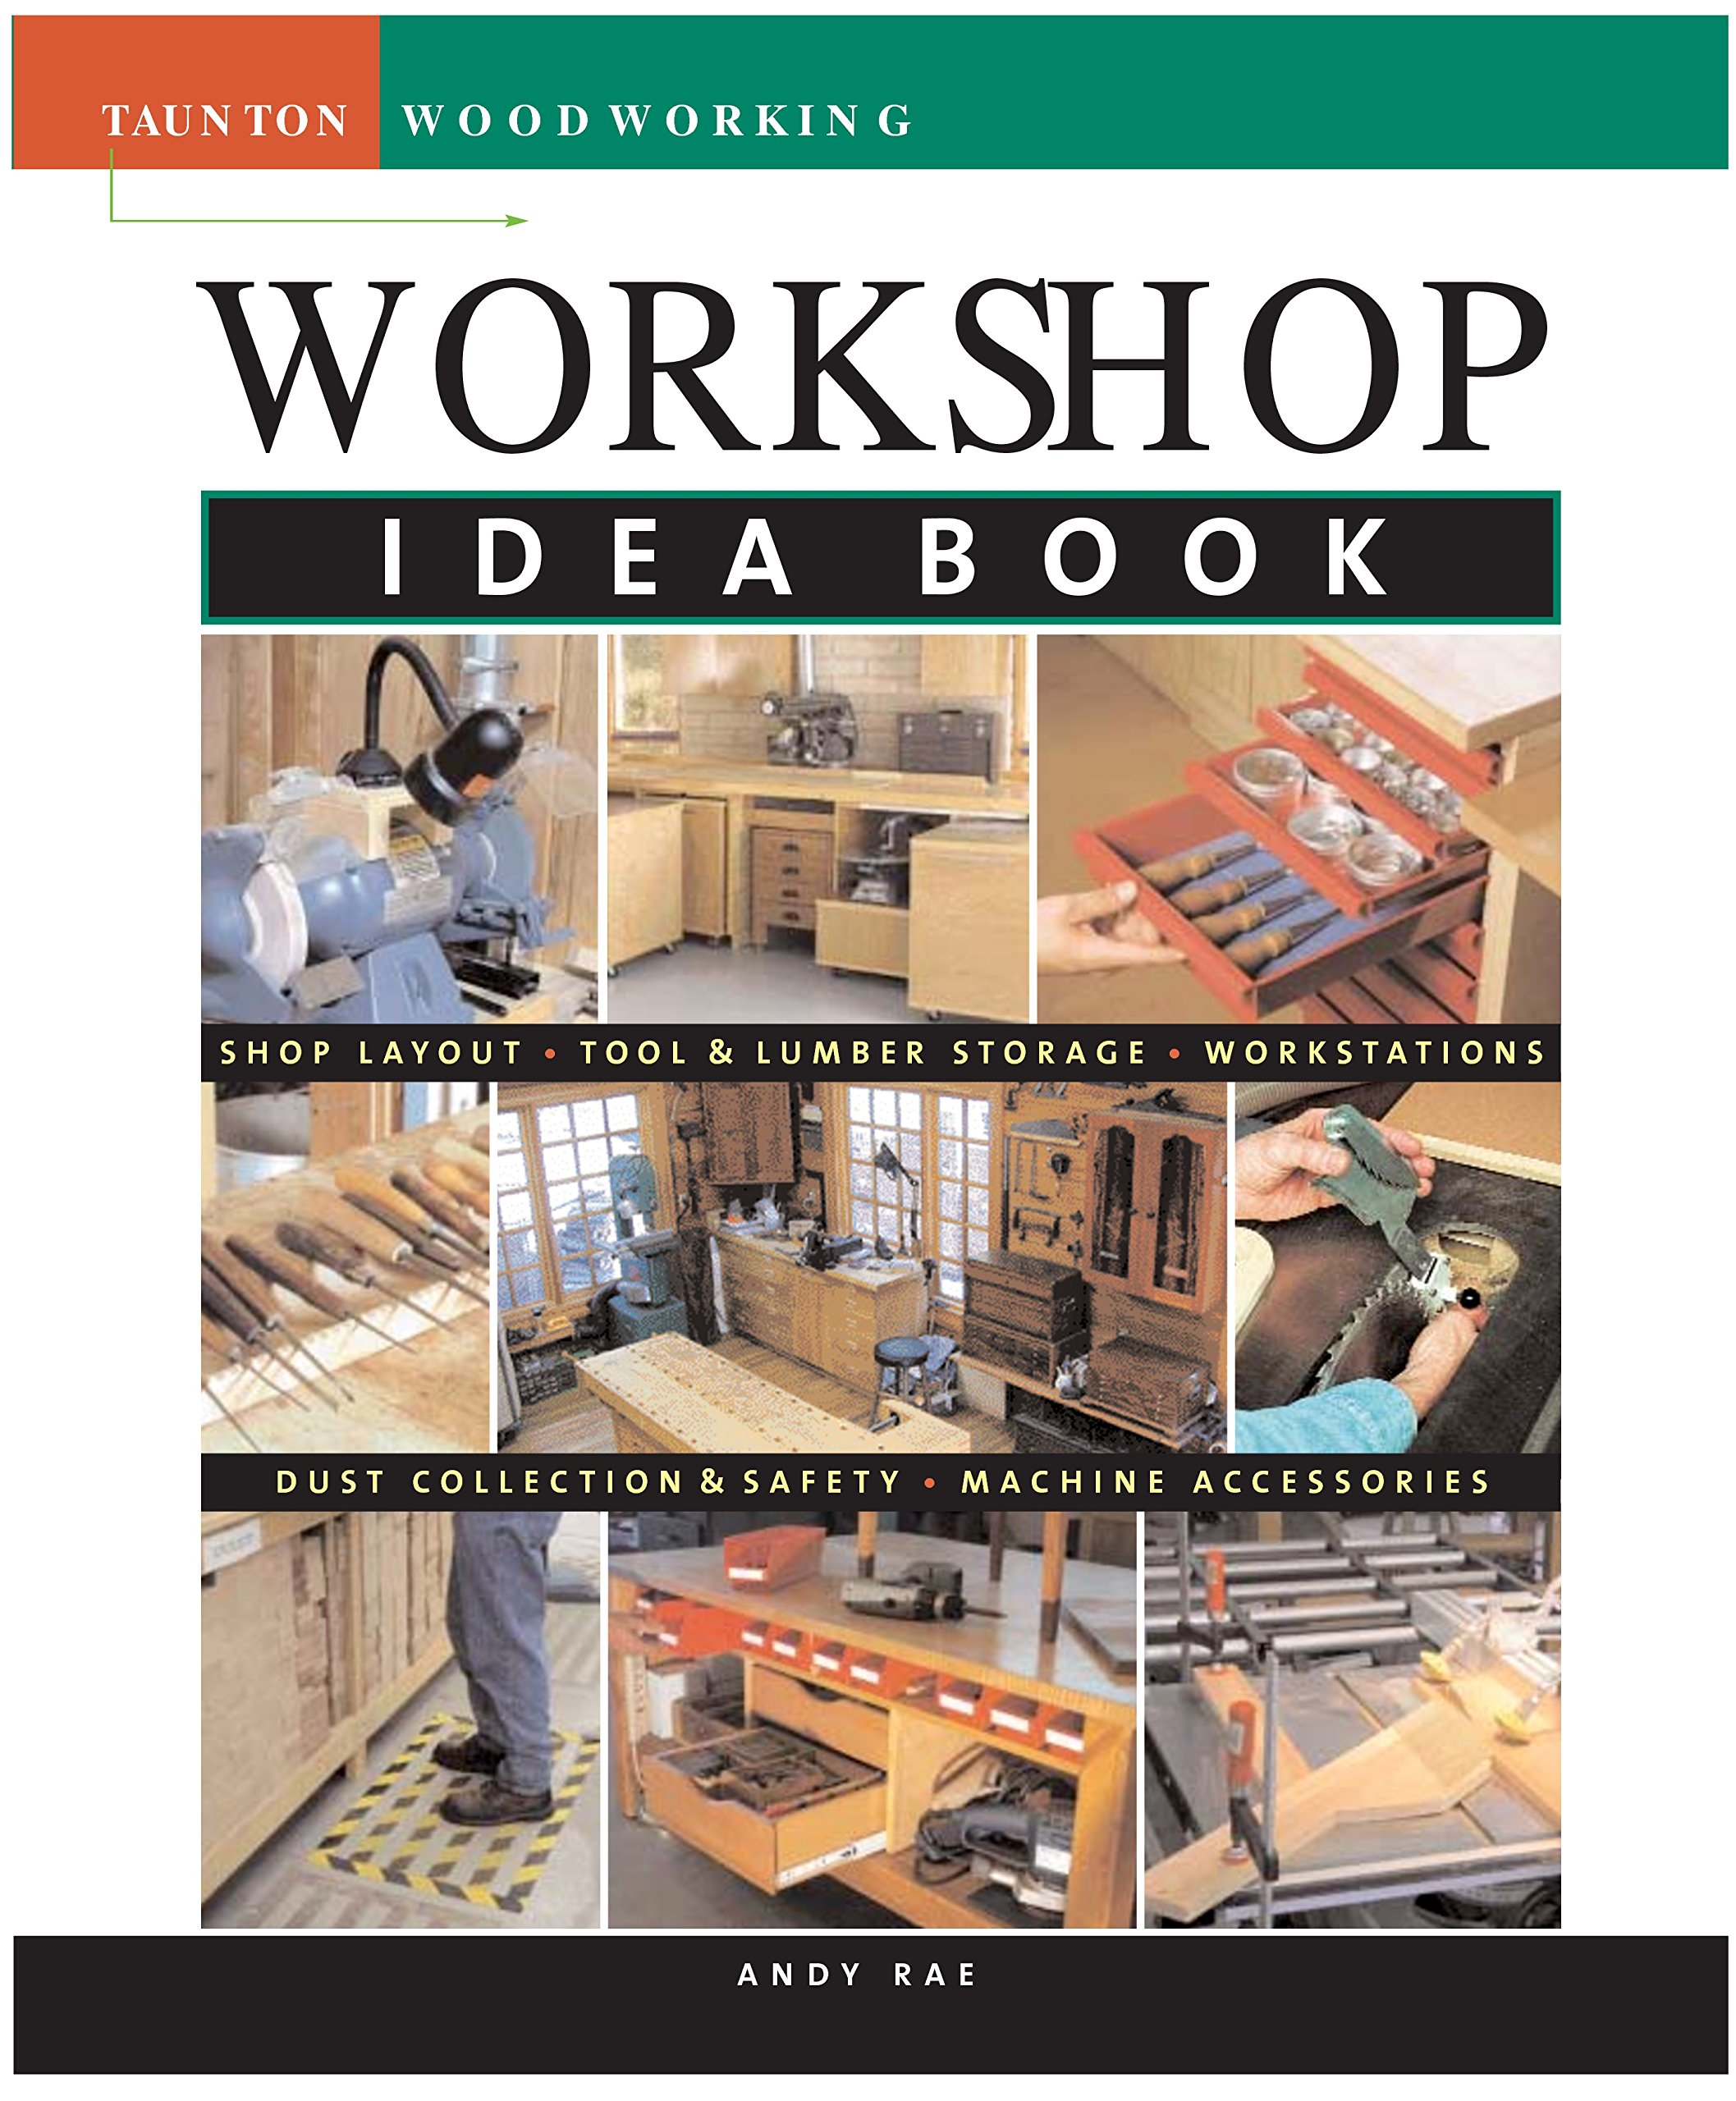 Workshop Idea Book (Tauton's Idea Book Series)